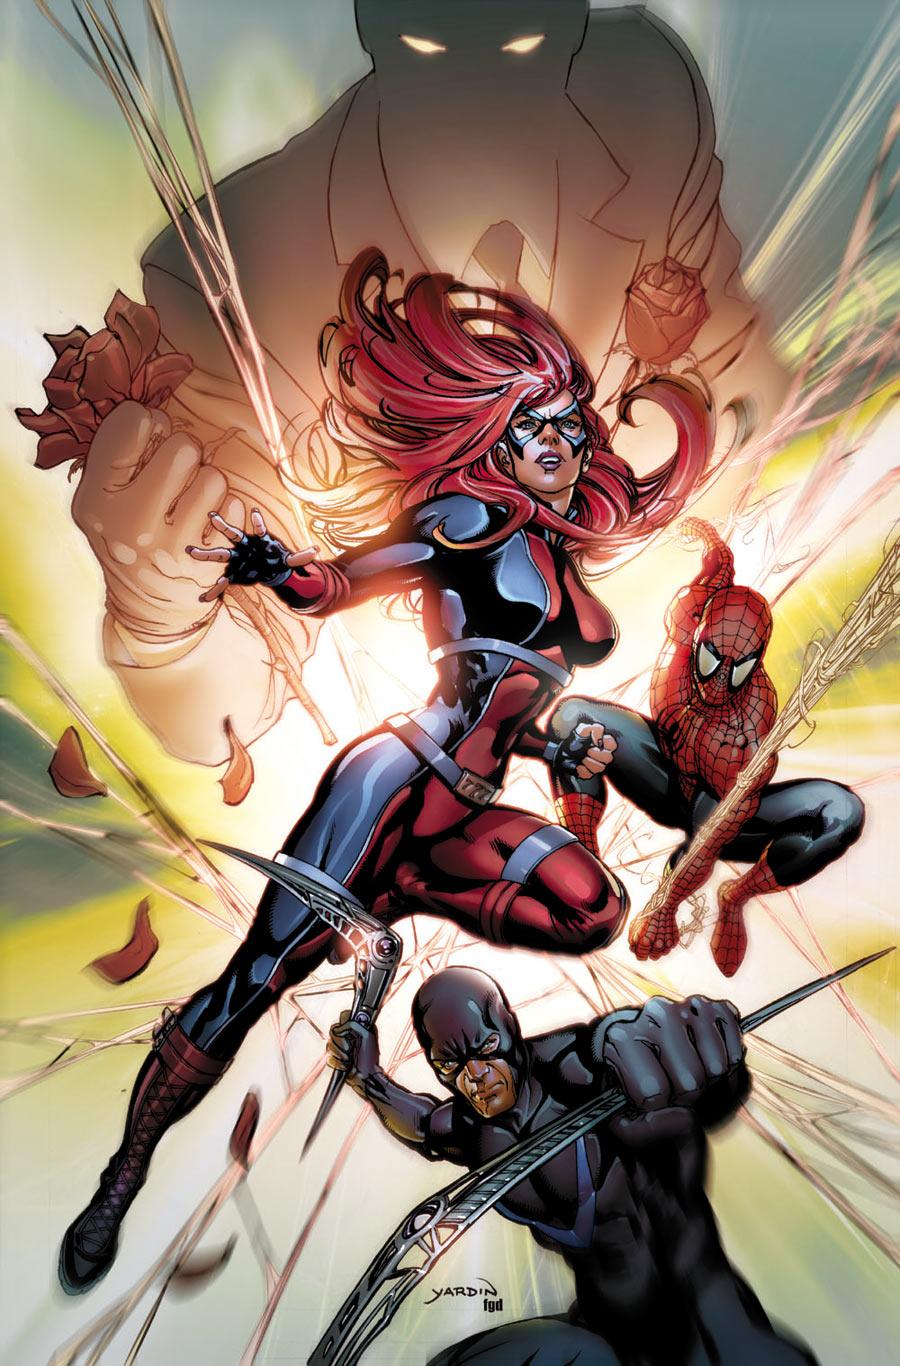 Part 14 / 9 Spider_Man_Presents_Jackpot_1_by_davidyardin